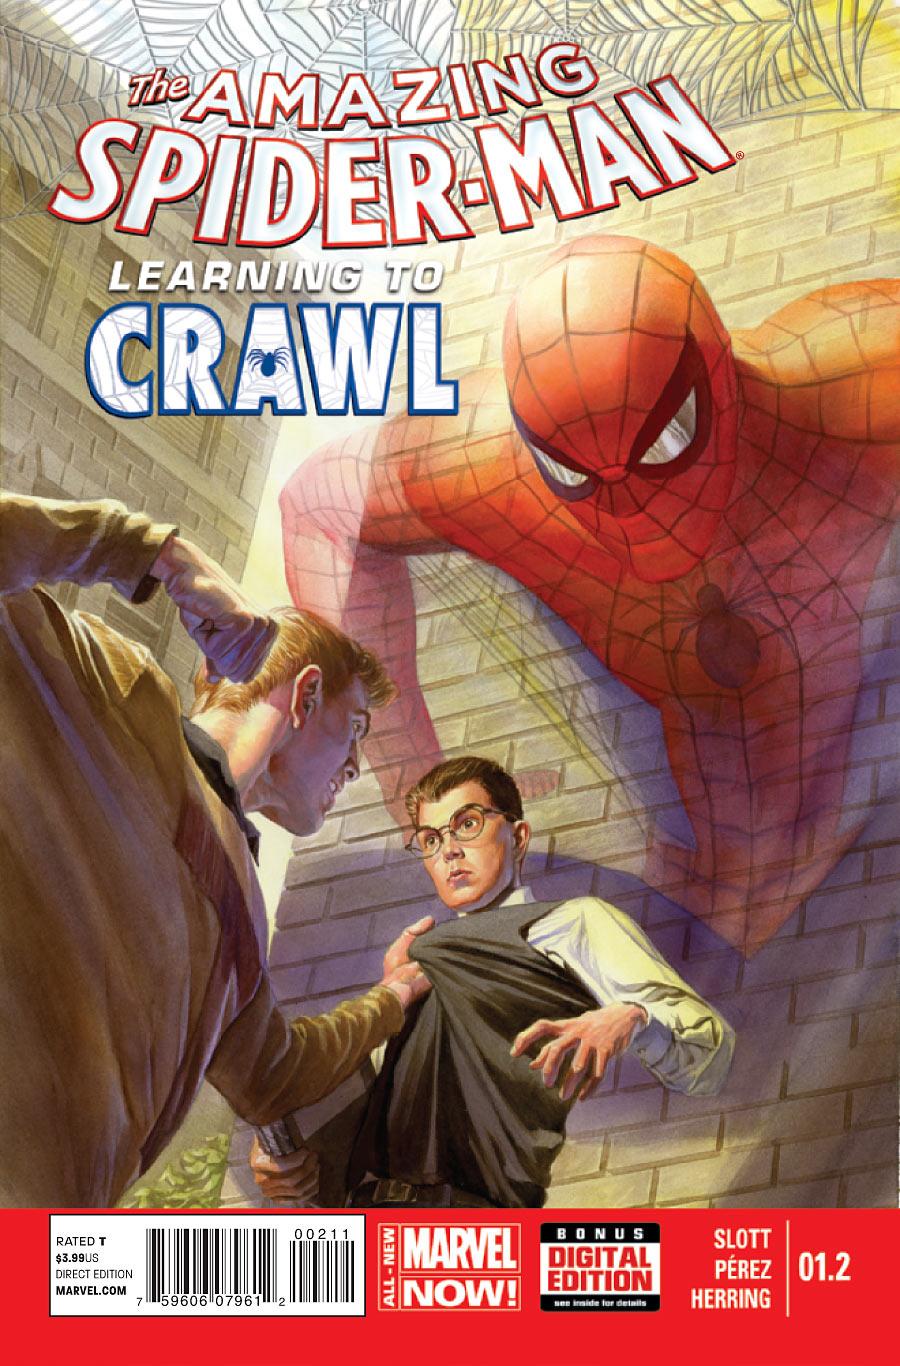 The Amazing Spider-Man #1.2